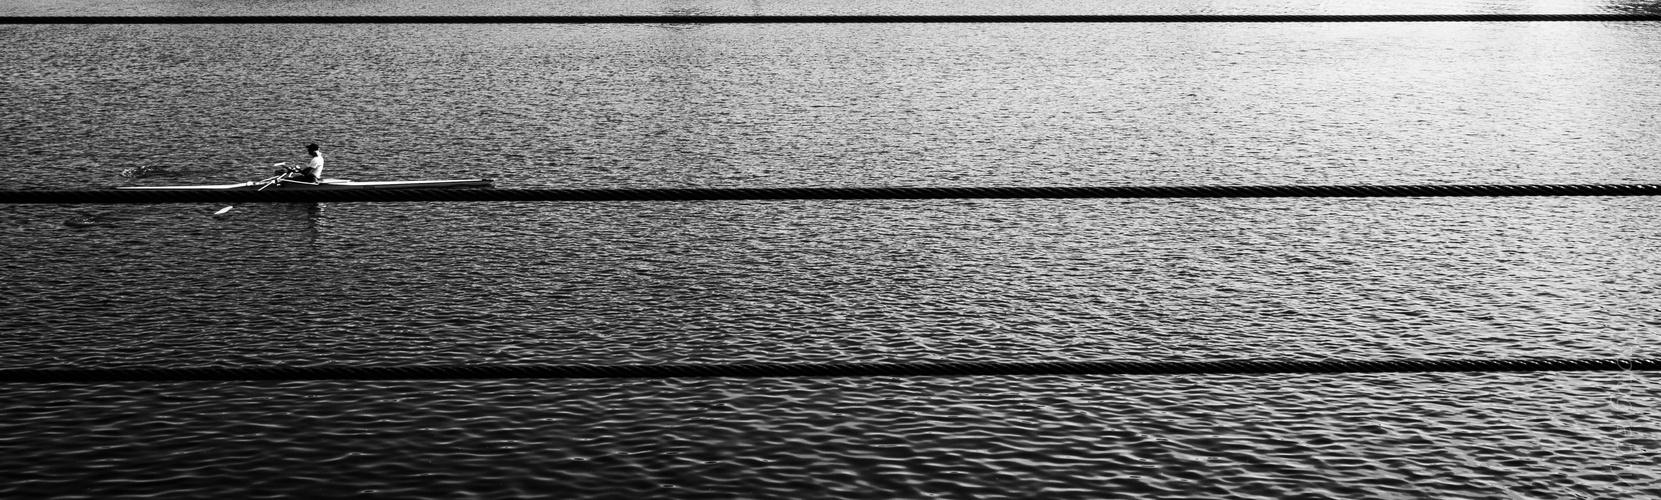 Linienboot